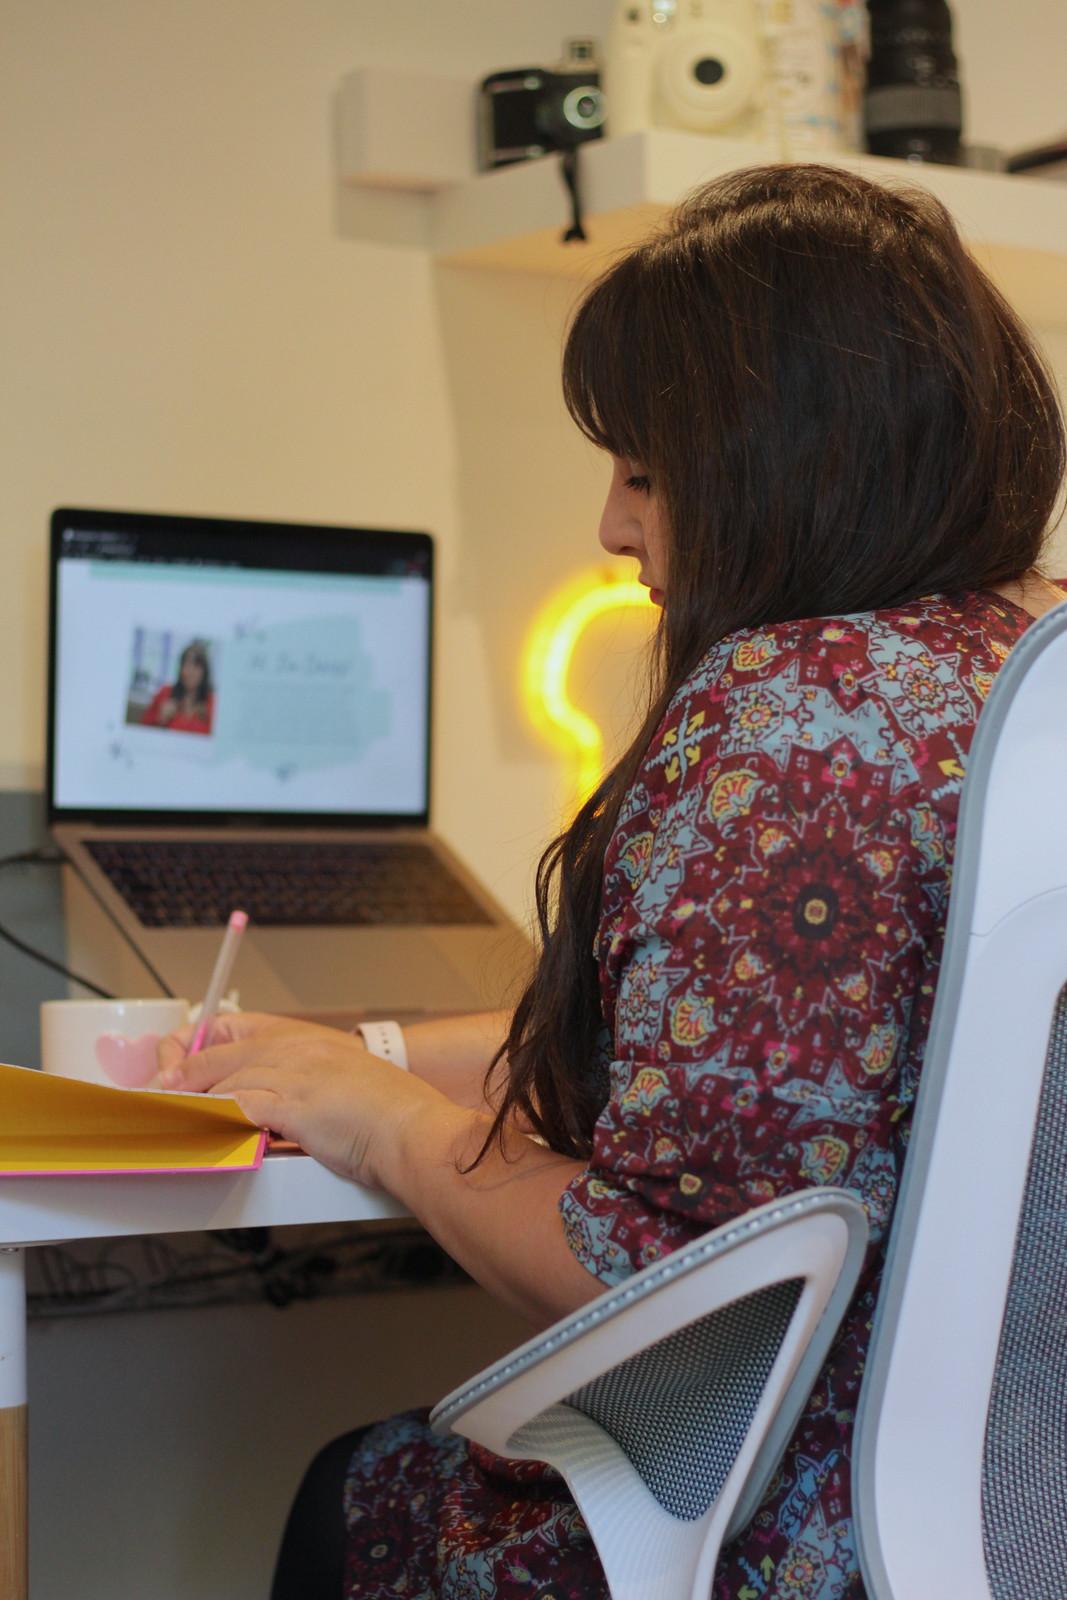 Cosm Chair - Prettygreentea - work from home